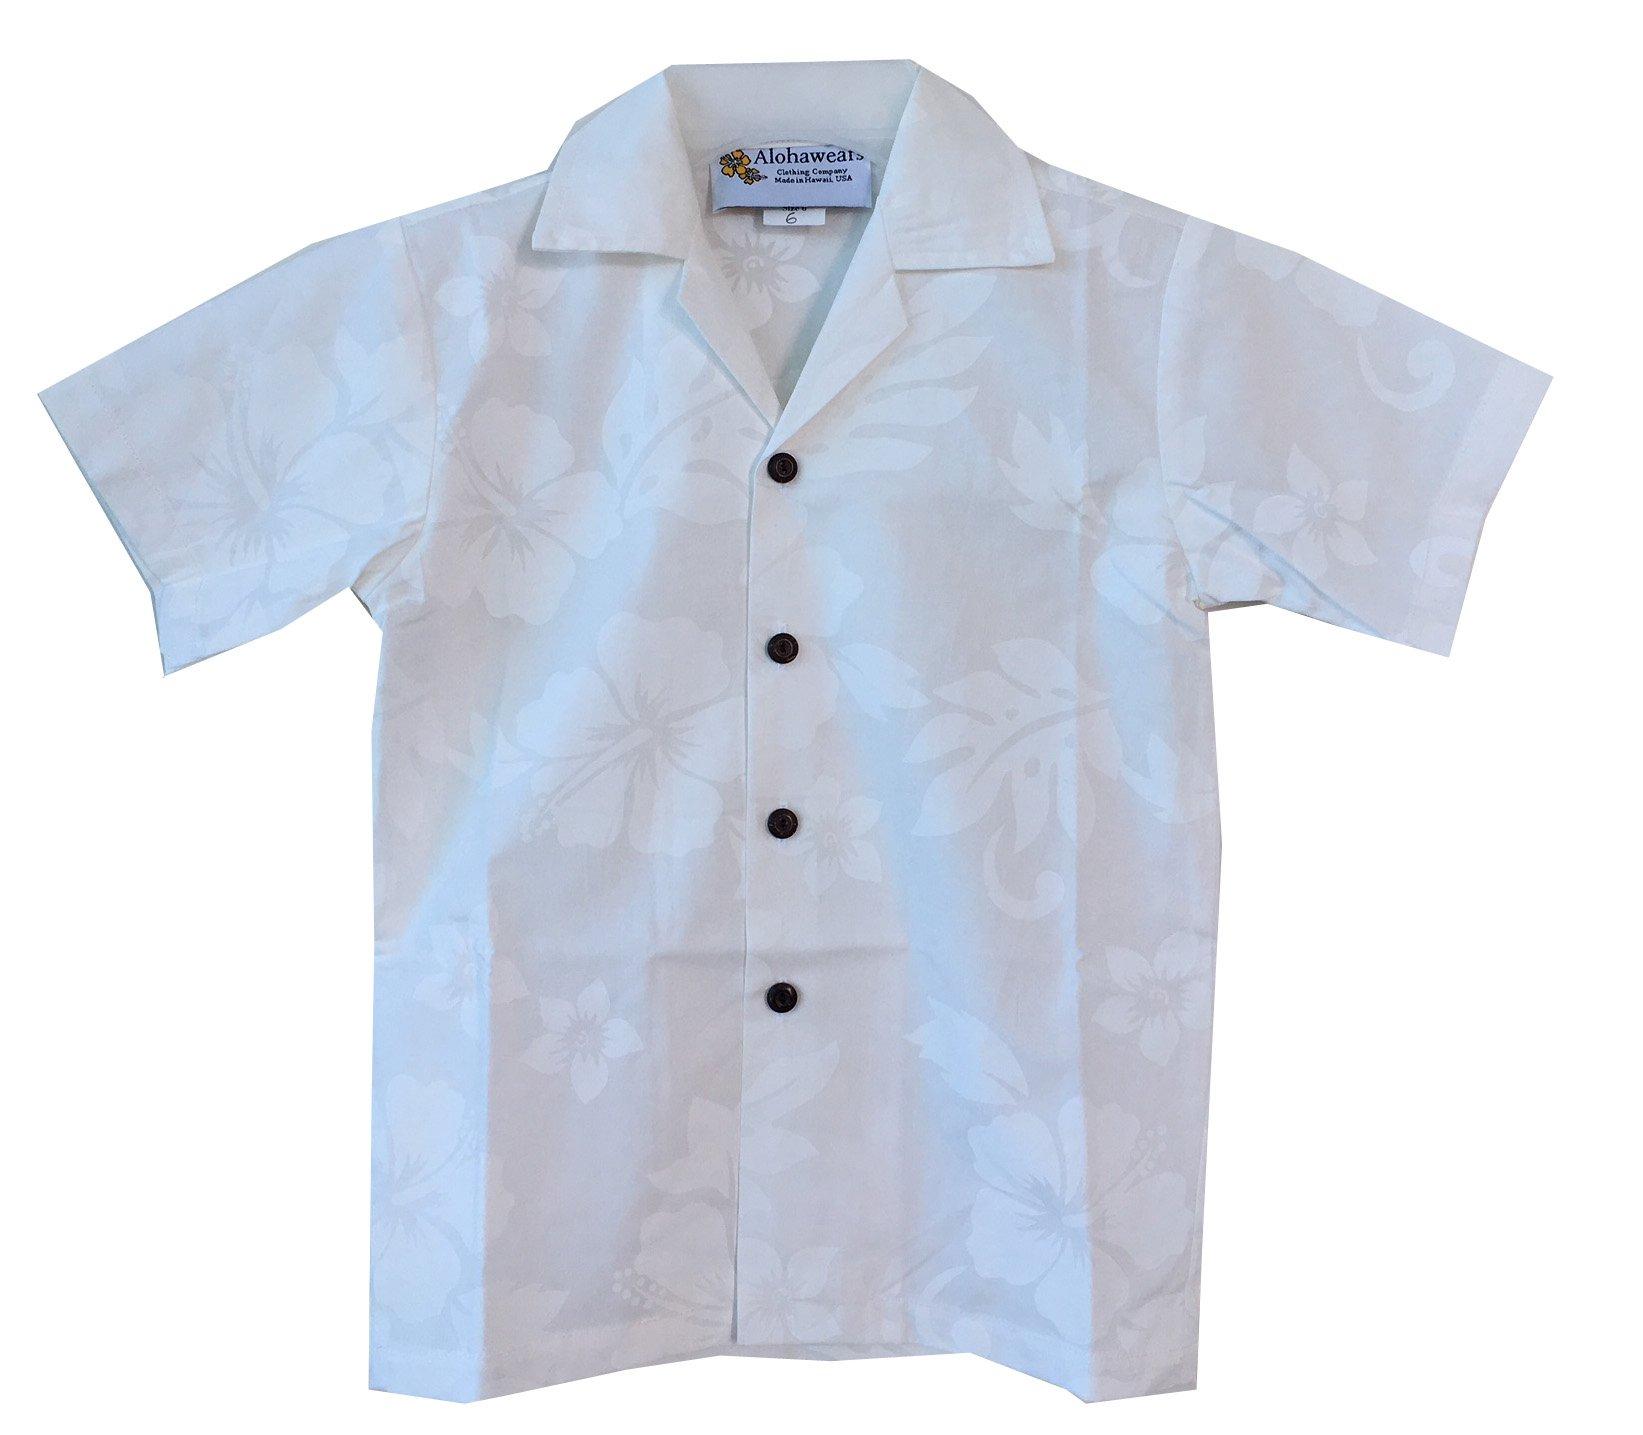 Alohawears Clothing Company Boy's White Wedding Cruise Luau Hawaiian Aloha Shirt (12, White/White)